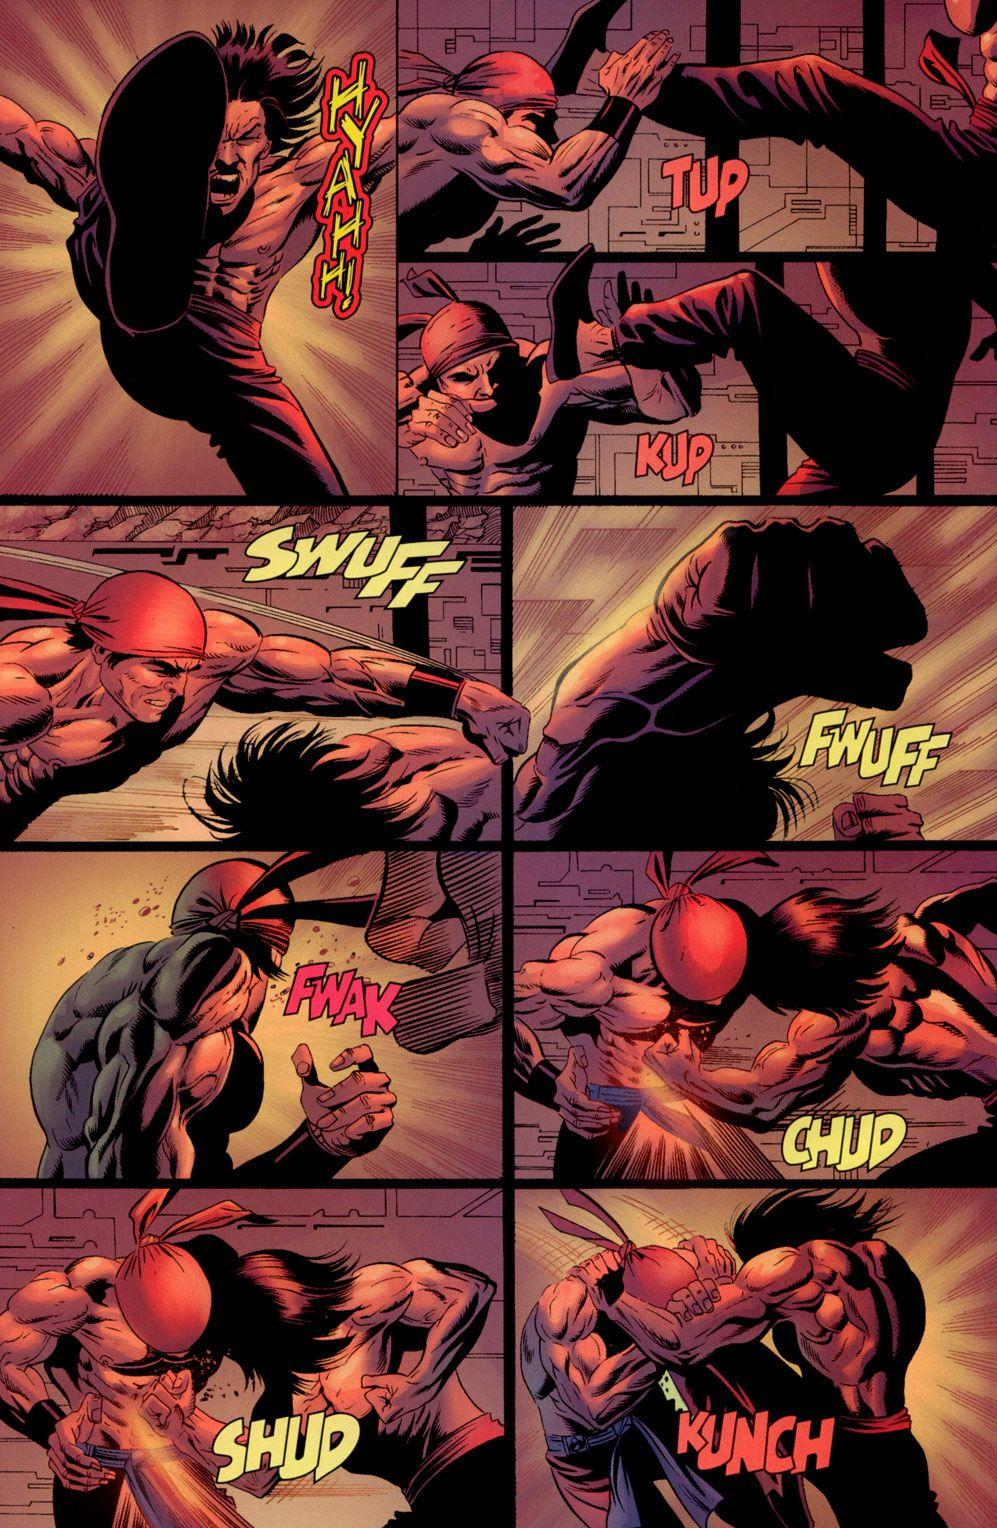 Shang Chi Master Of Kung Fu Issue 6 Read Shang Chi Master Of Kung Fu Issue 6 Comic Online In High Quality Comics Classic Comic Books Classic Comics